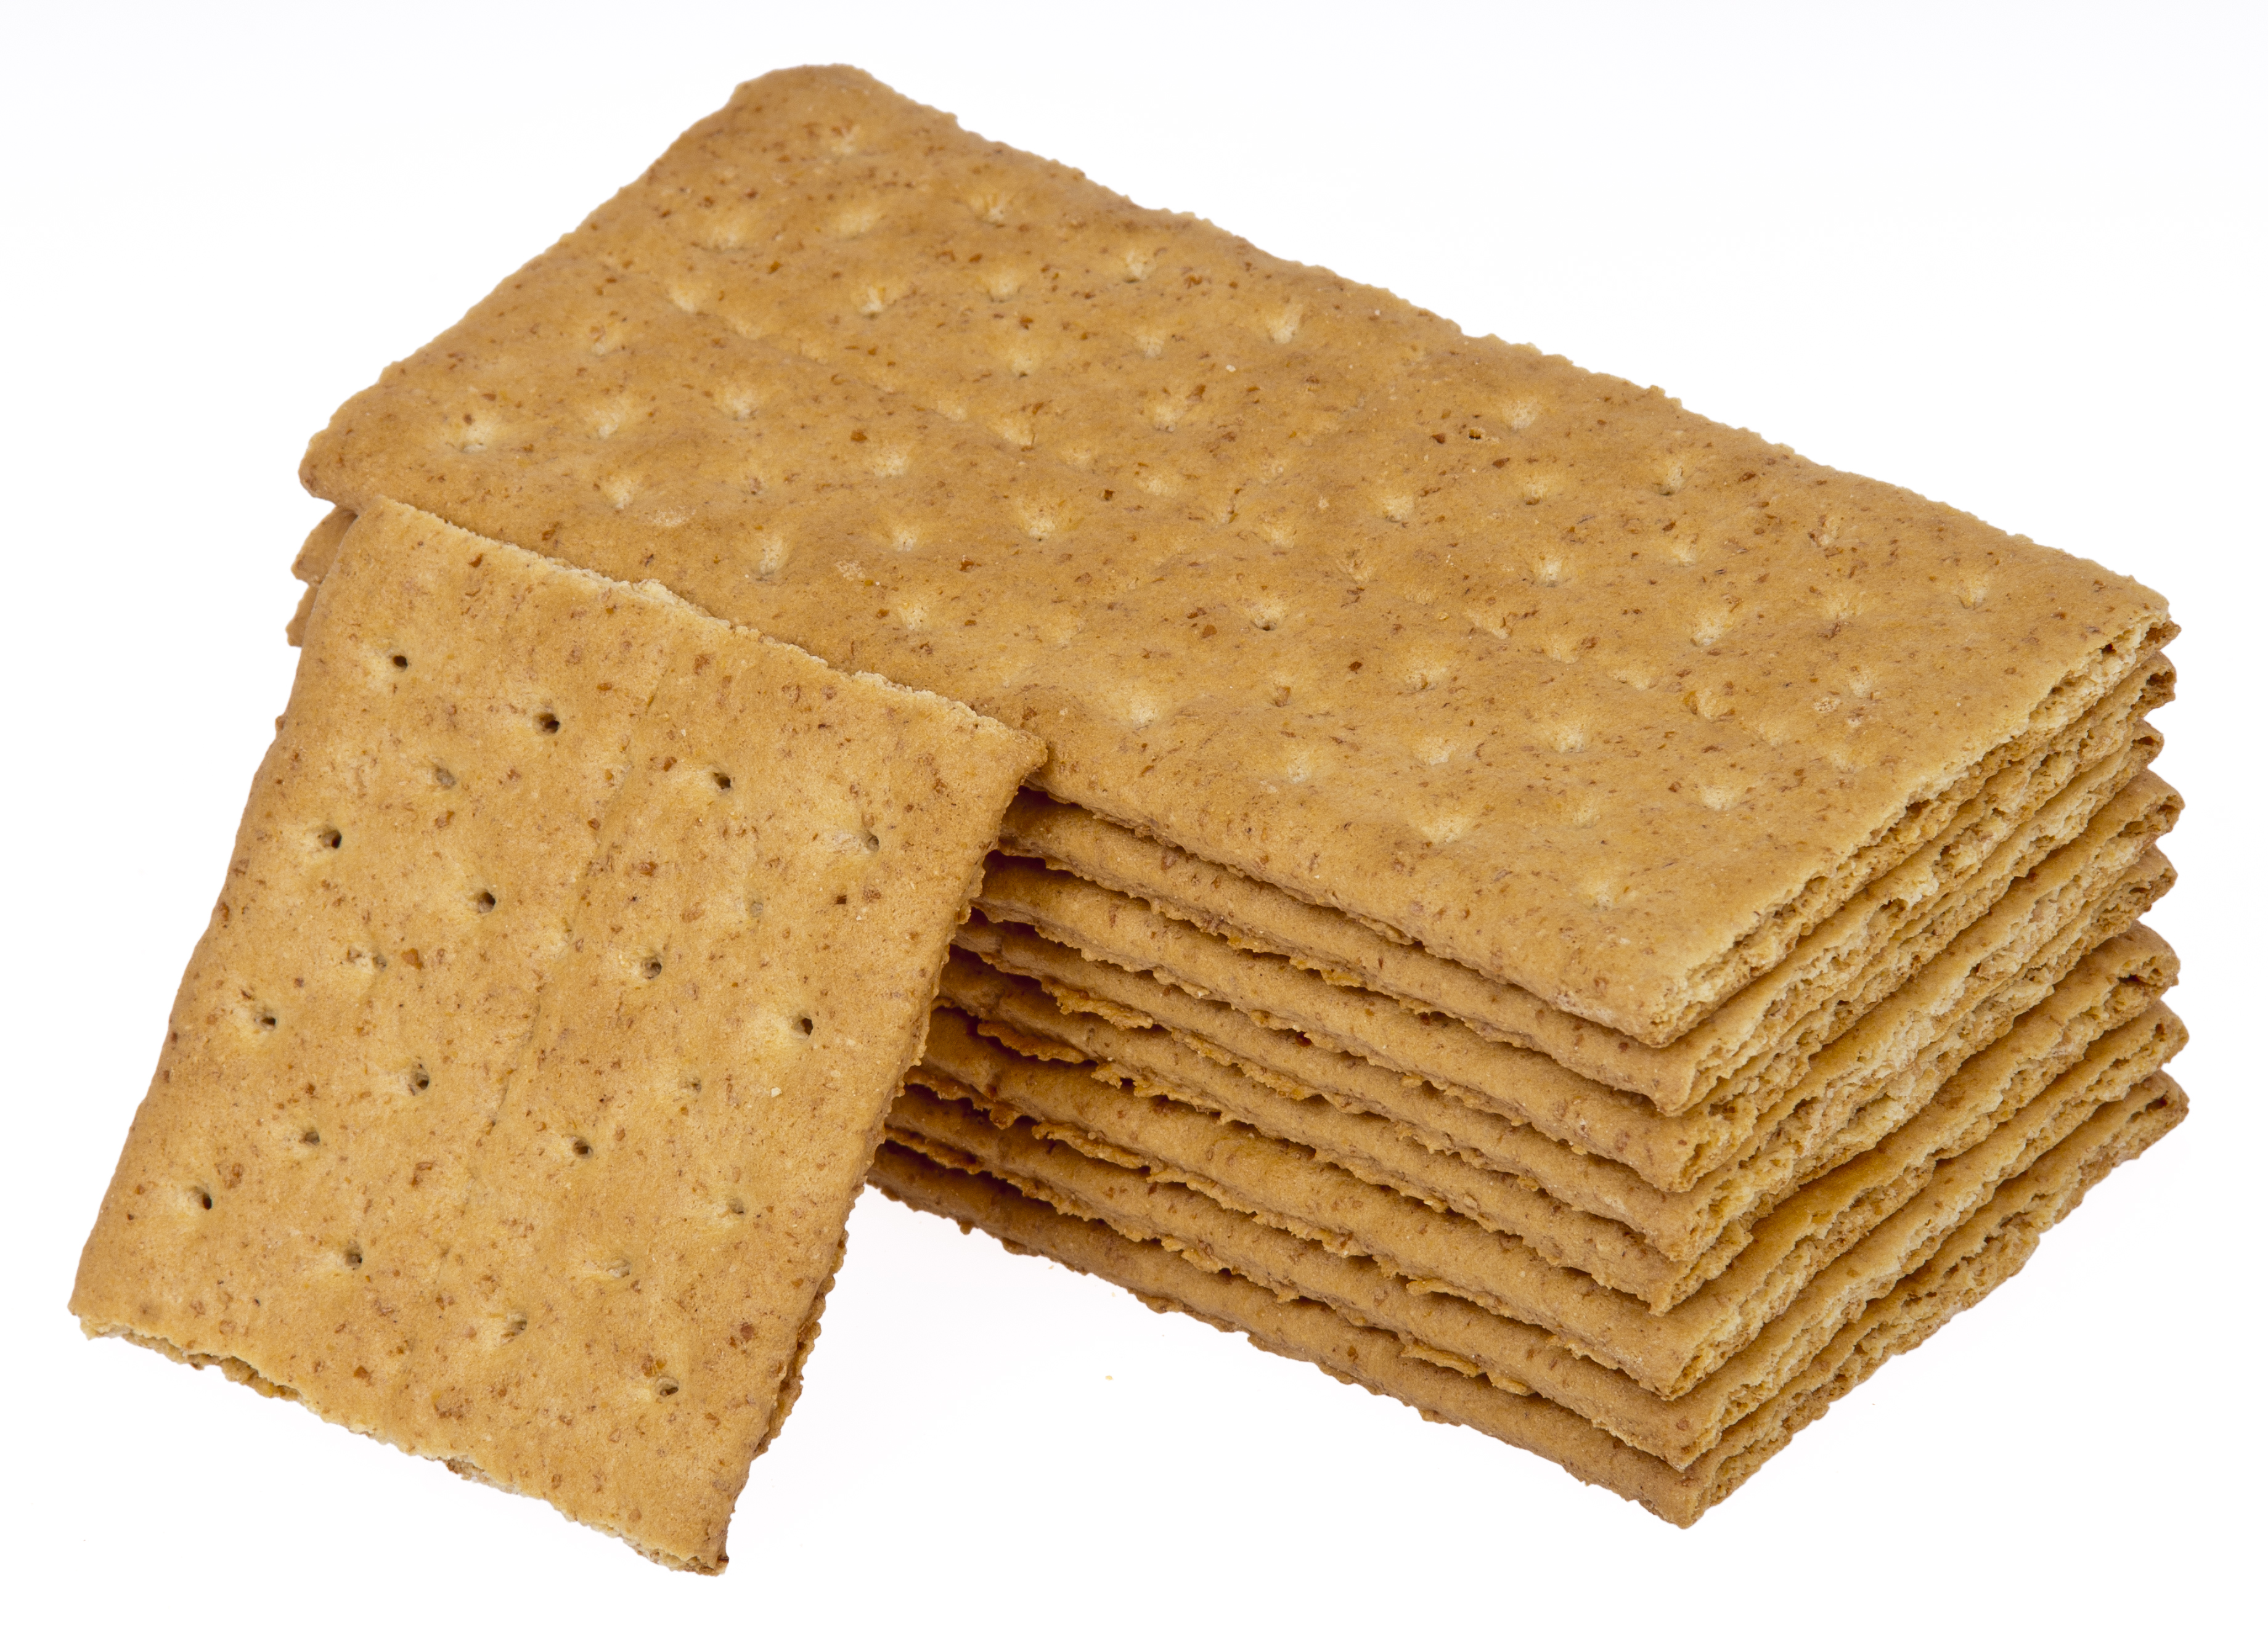 Graham crackers for making S'more Fudge Bars